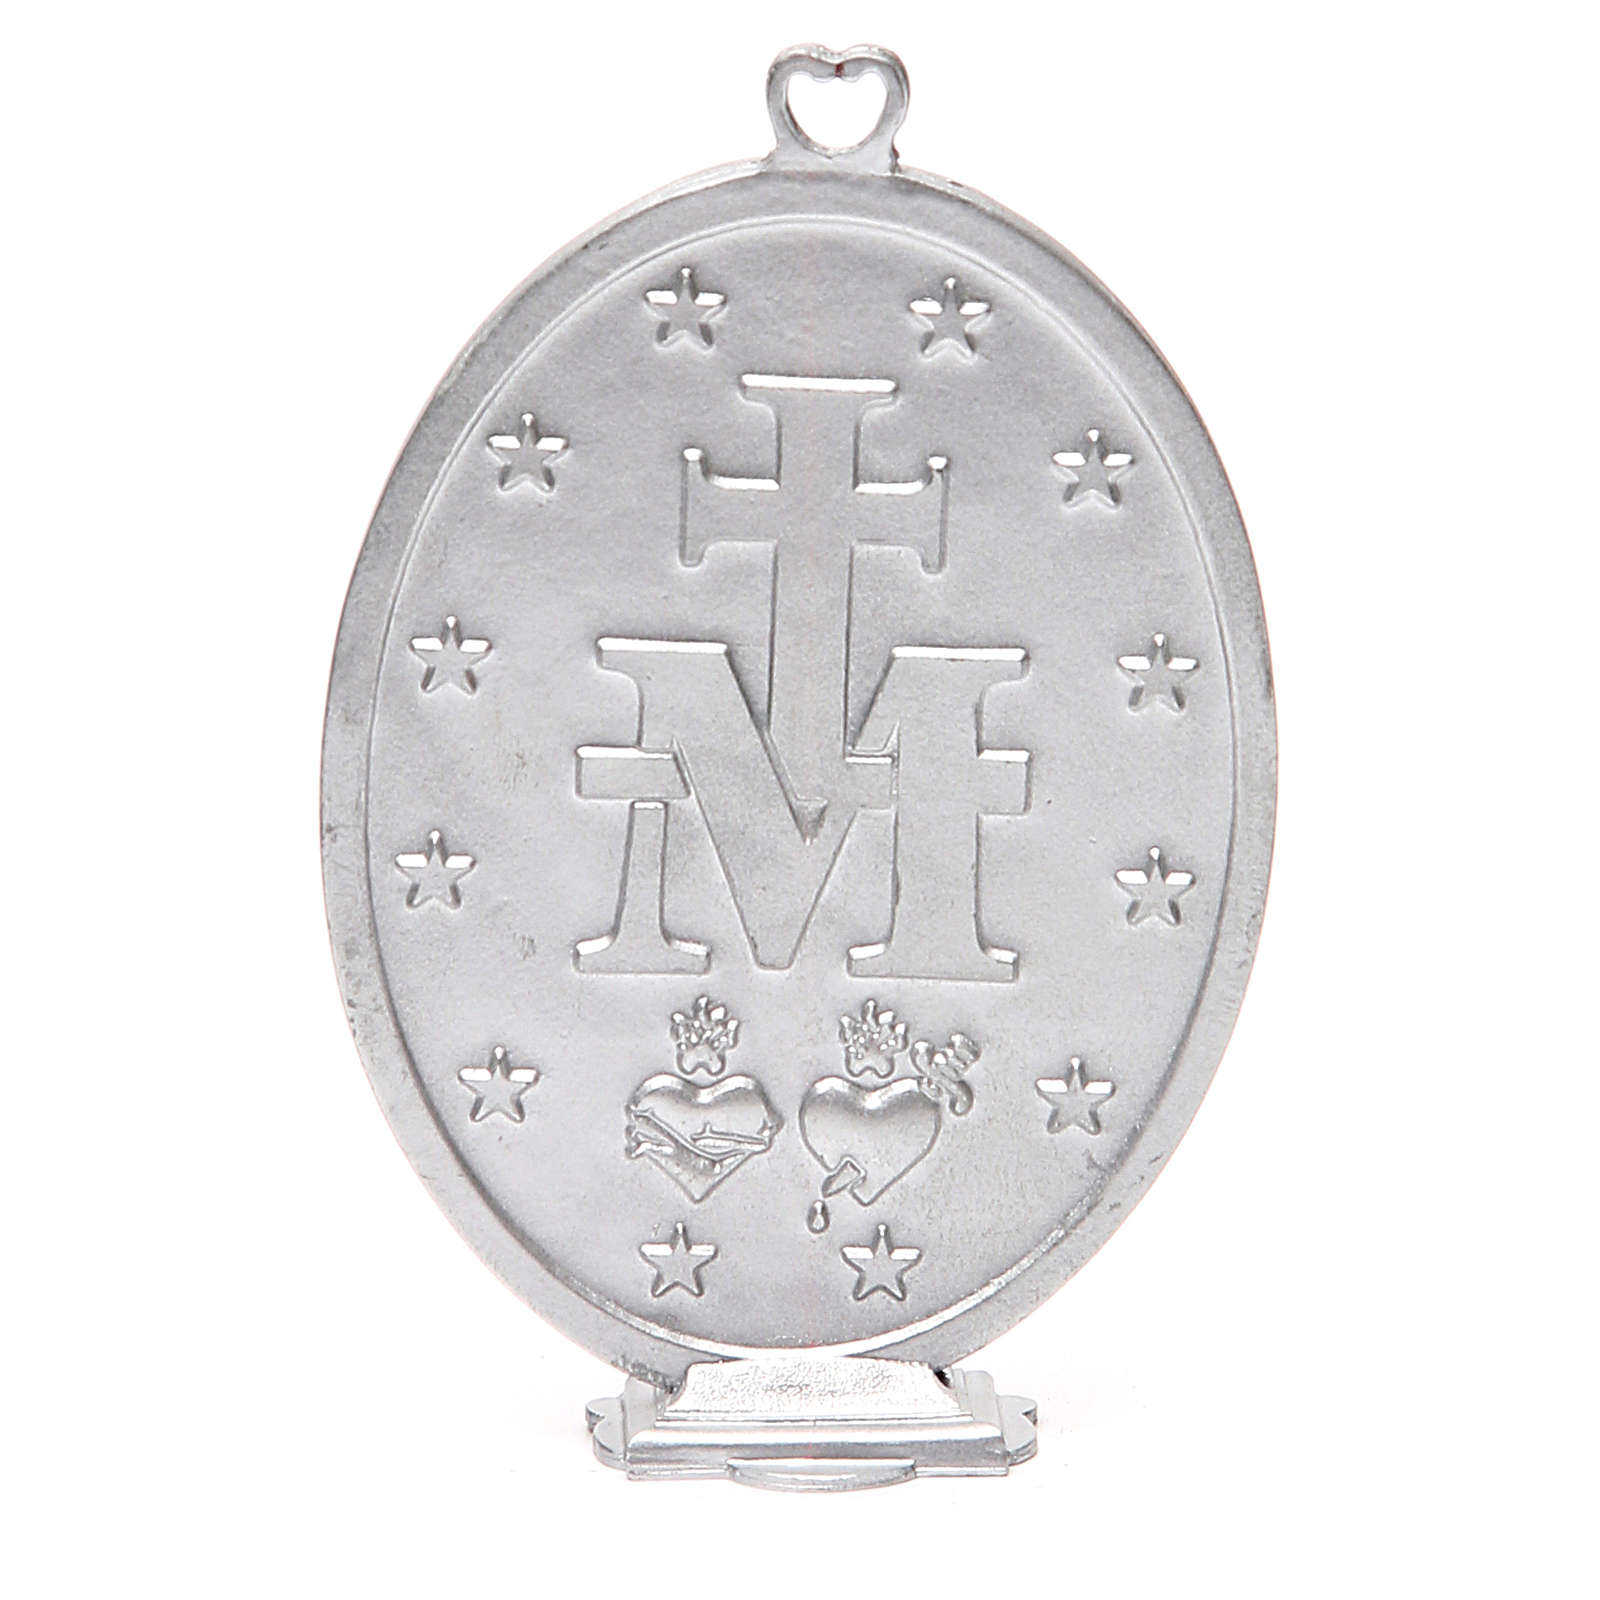 Miraculous Medal in galvanised zamak, antique blue 12.5cm 4